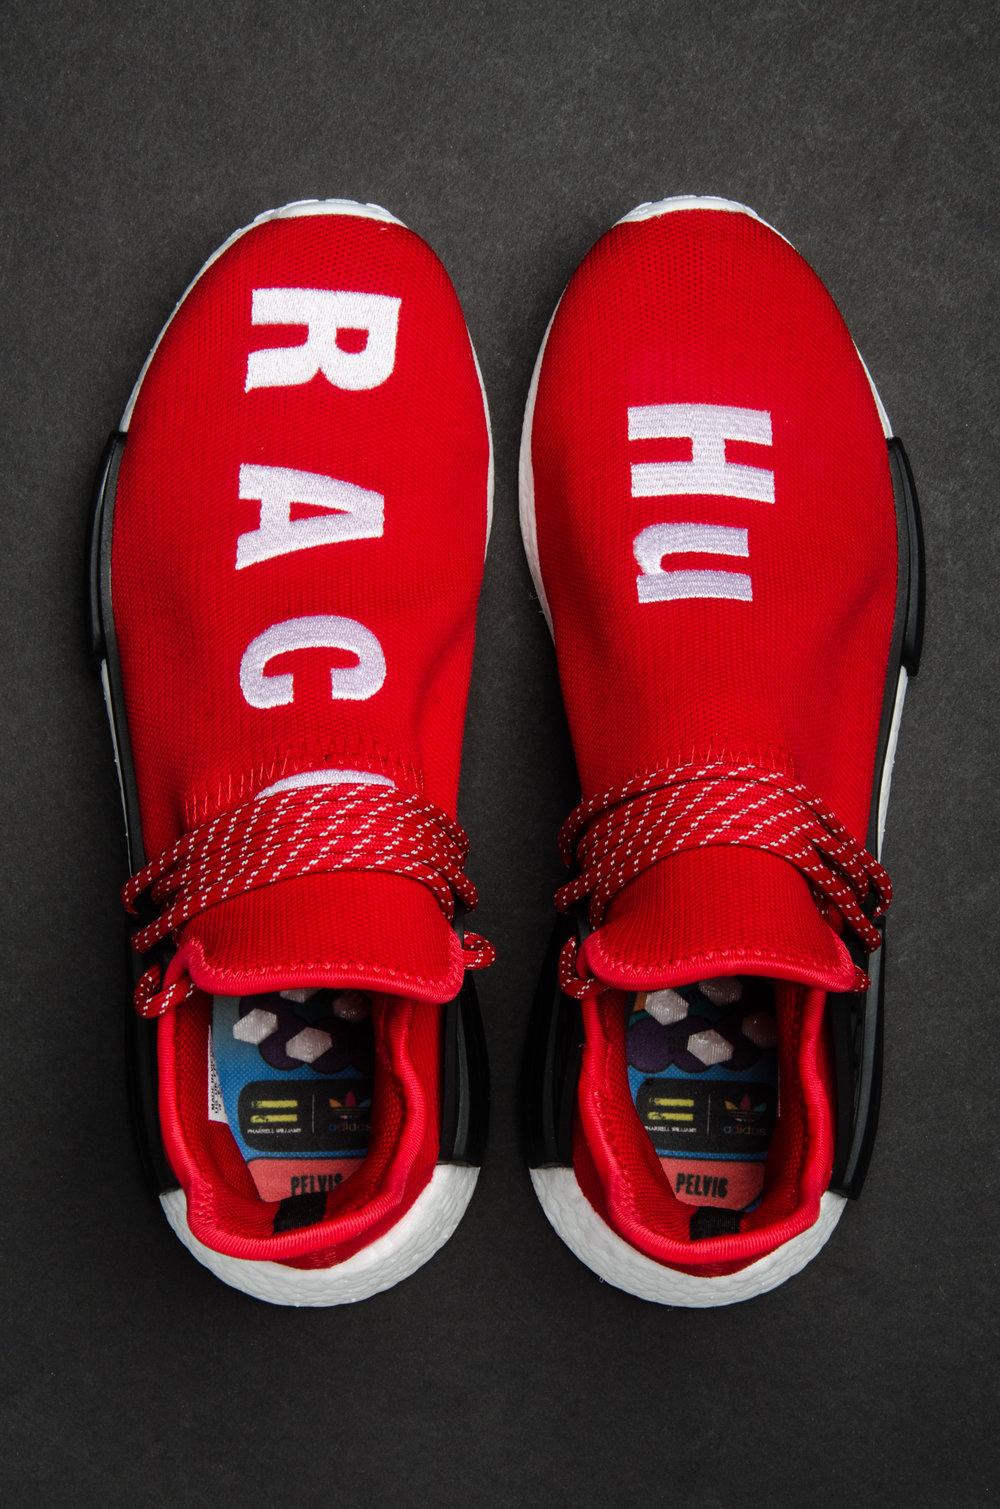 NEW 2017 UA Adidas PW Human Race NMD Originals Rose